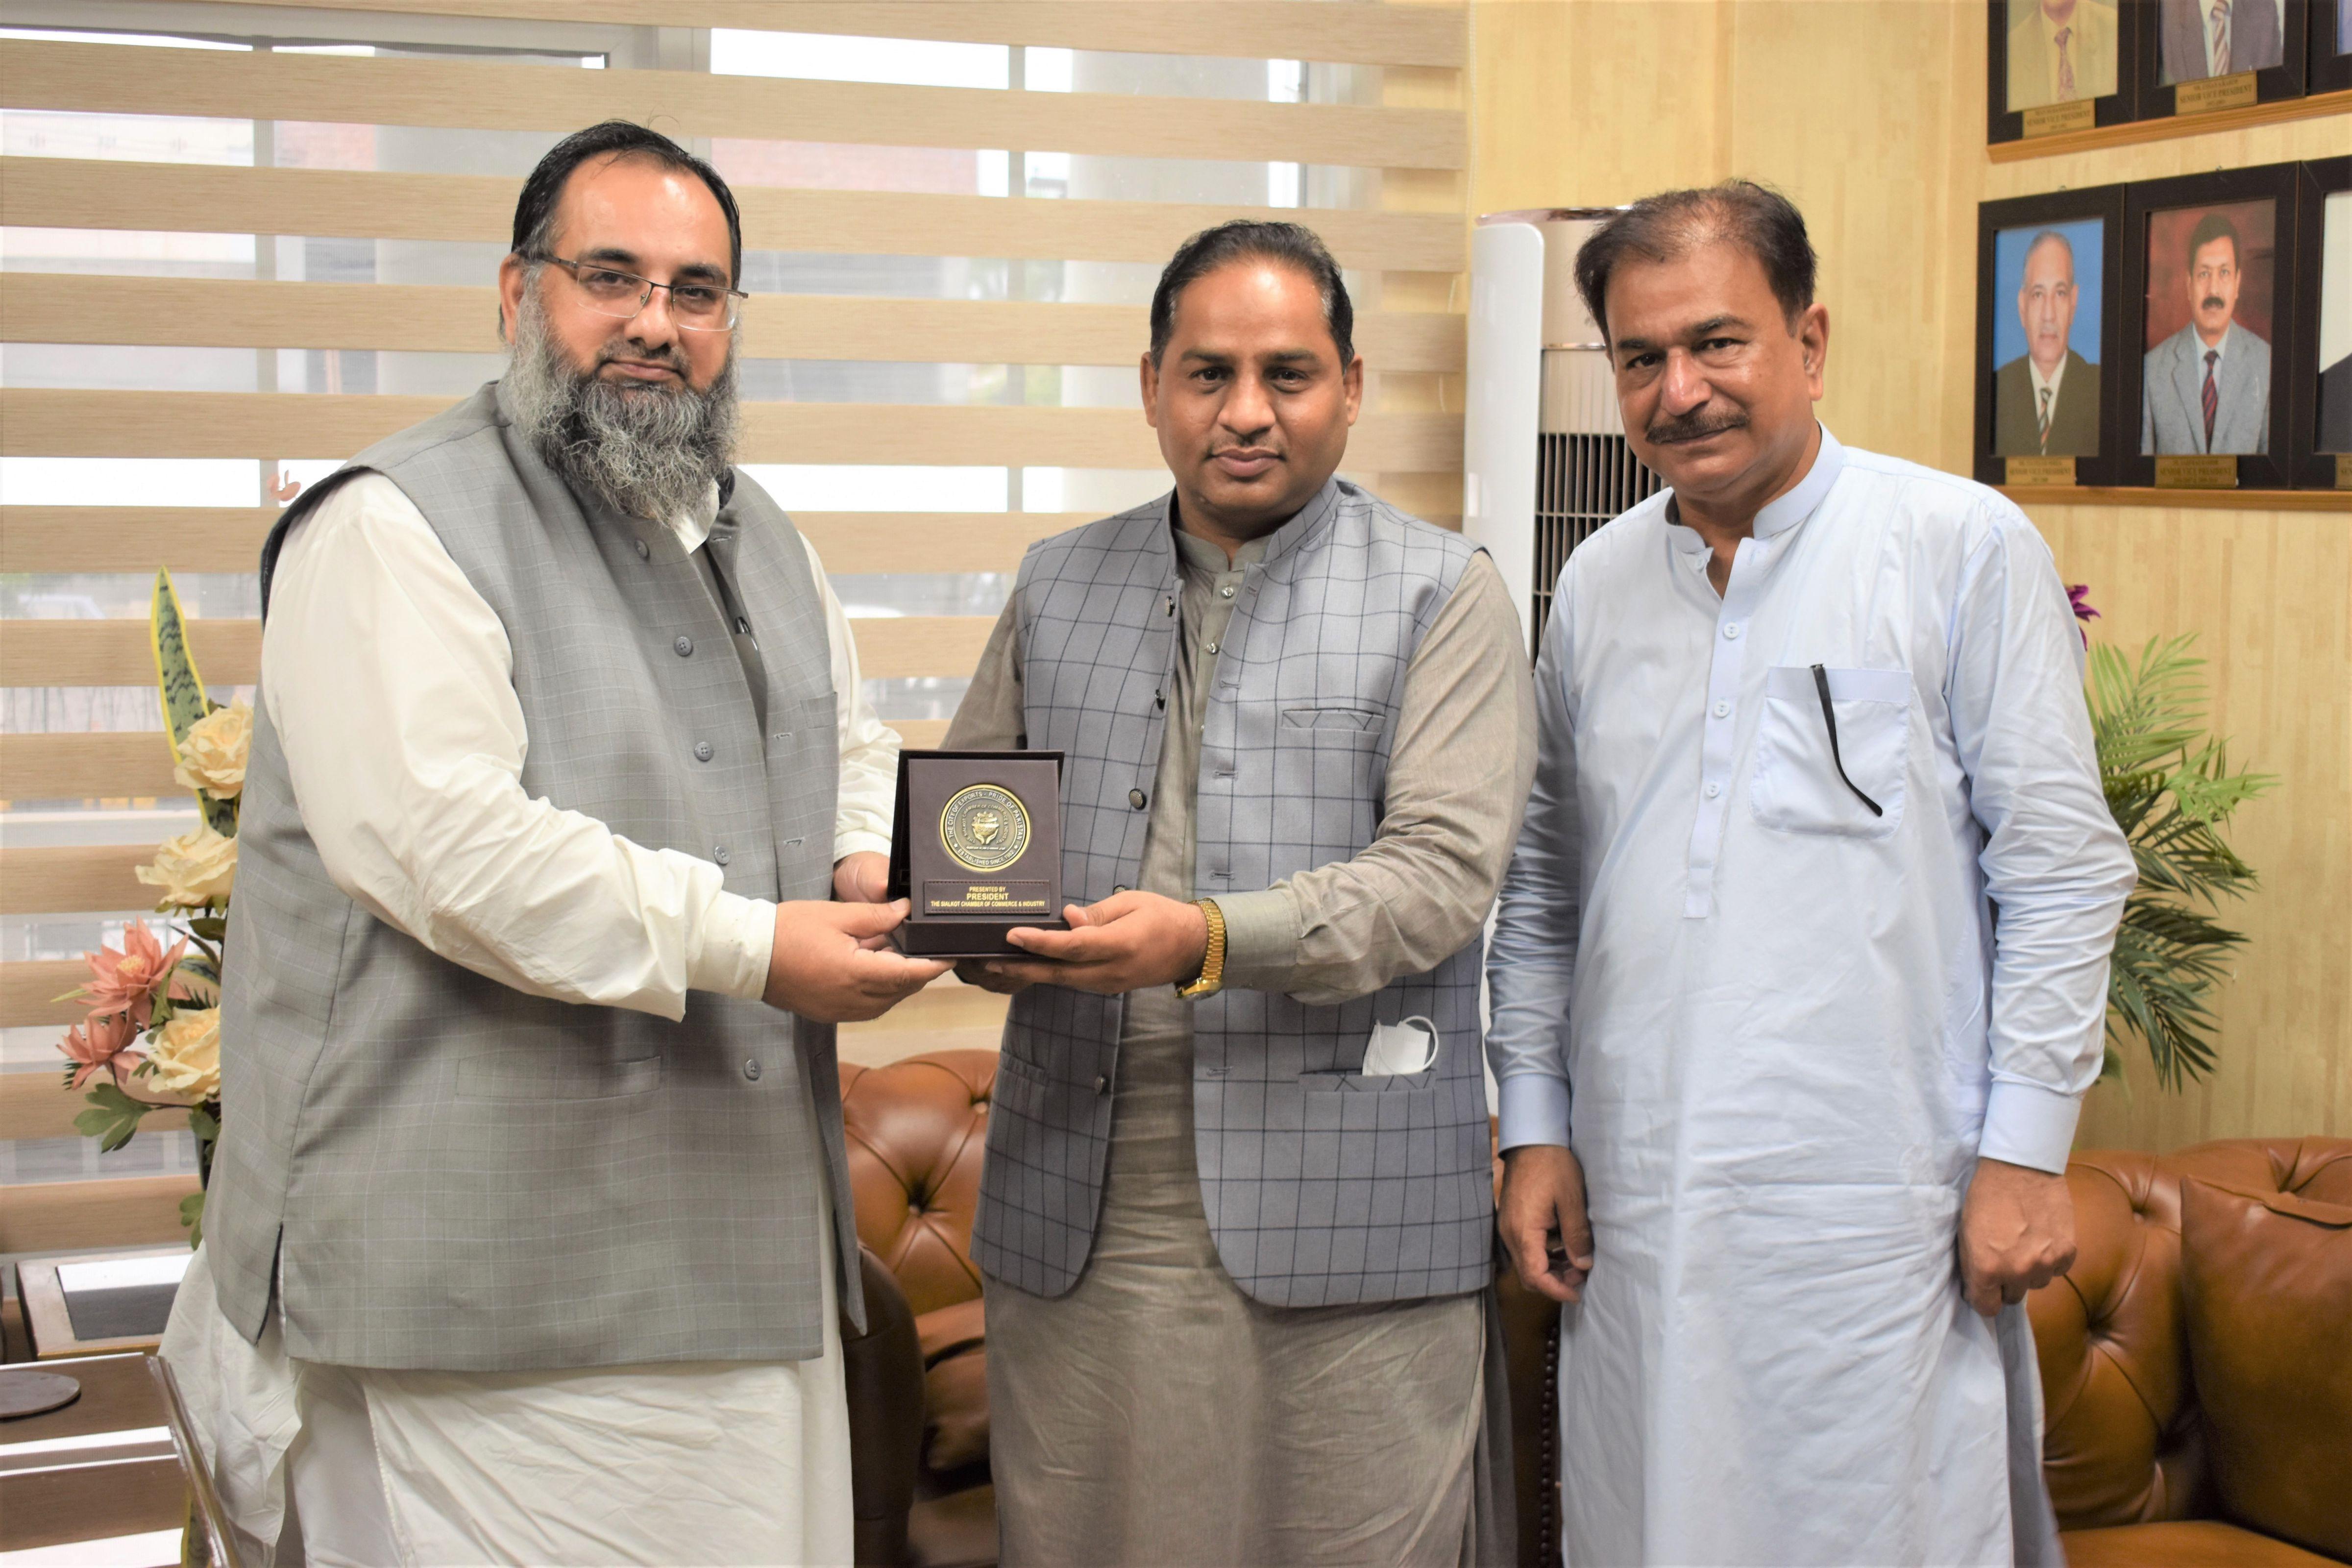 On September 8, 2021, Mr. Khuram Aslam, Senior Vice President, Sialkot Chamber of Commerce & Industry had a meeting with Mr. Ashraf Ali, Superintending Engineer (SE), WAPDA to discuss matters of mutual interest.